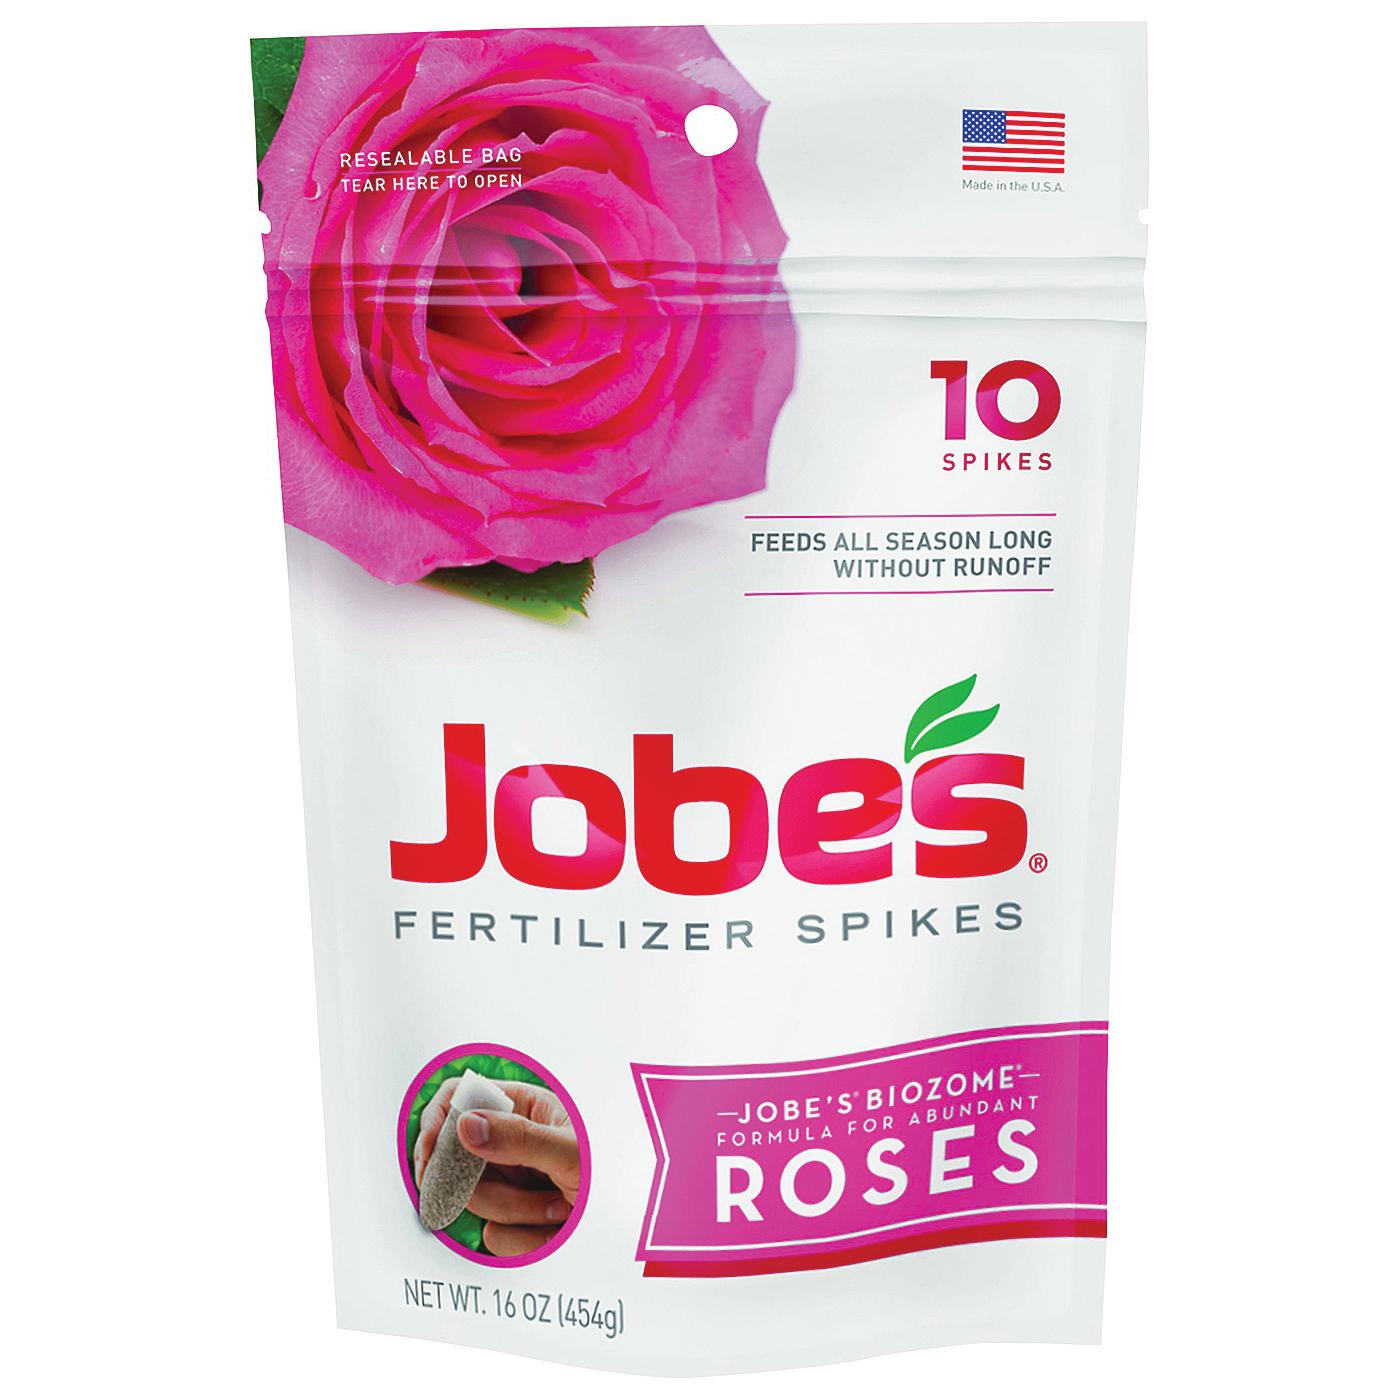 Picture of Jobes 04102 Fertilizer Spike Pouch, Spike, Gray/Light Brown, Slight Ammonia, Pouch